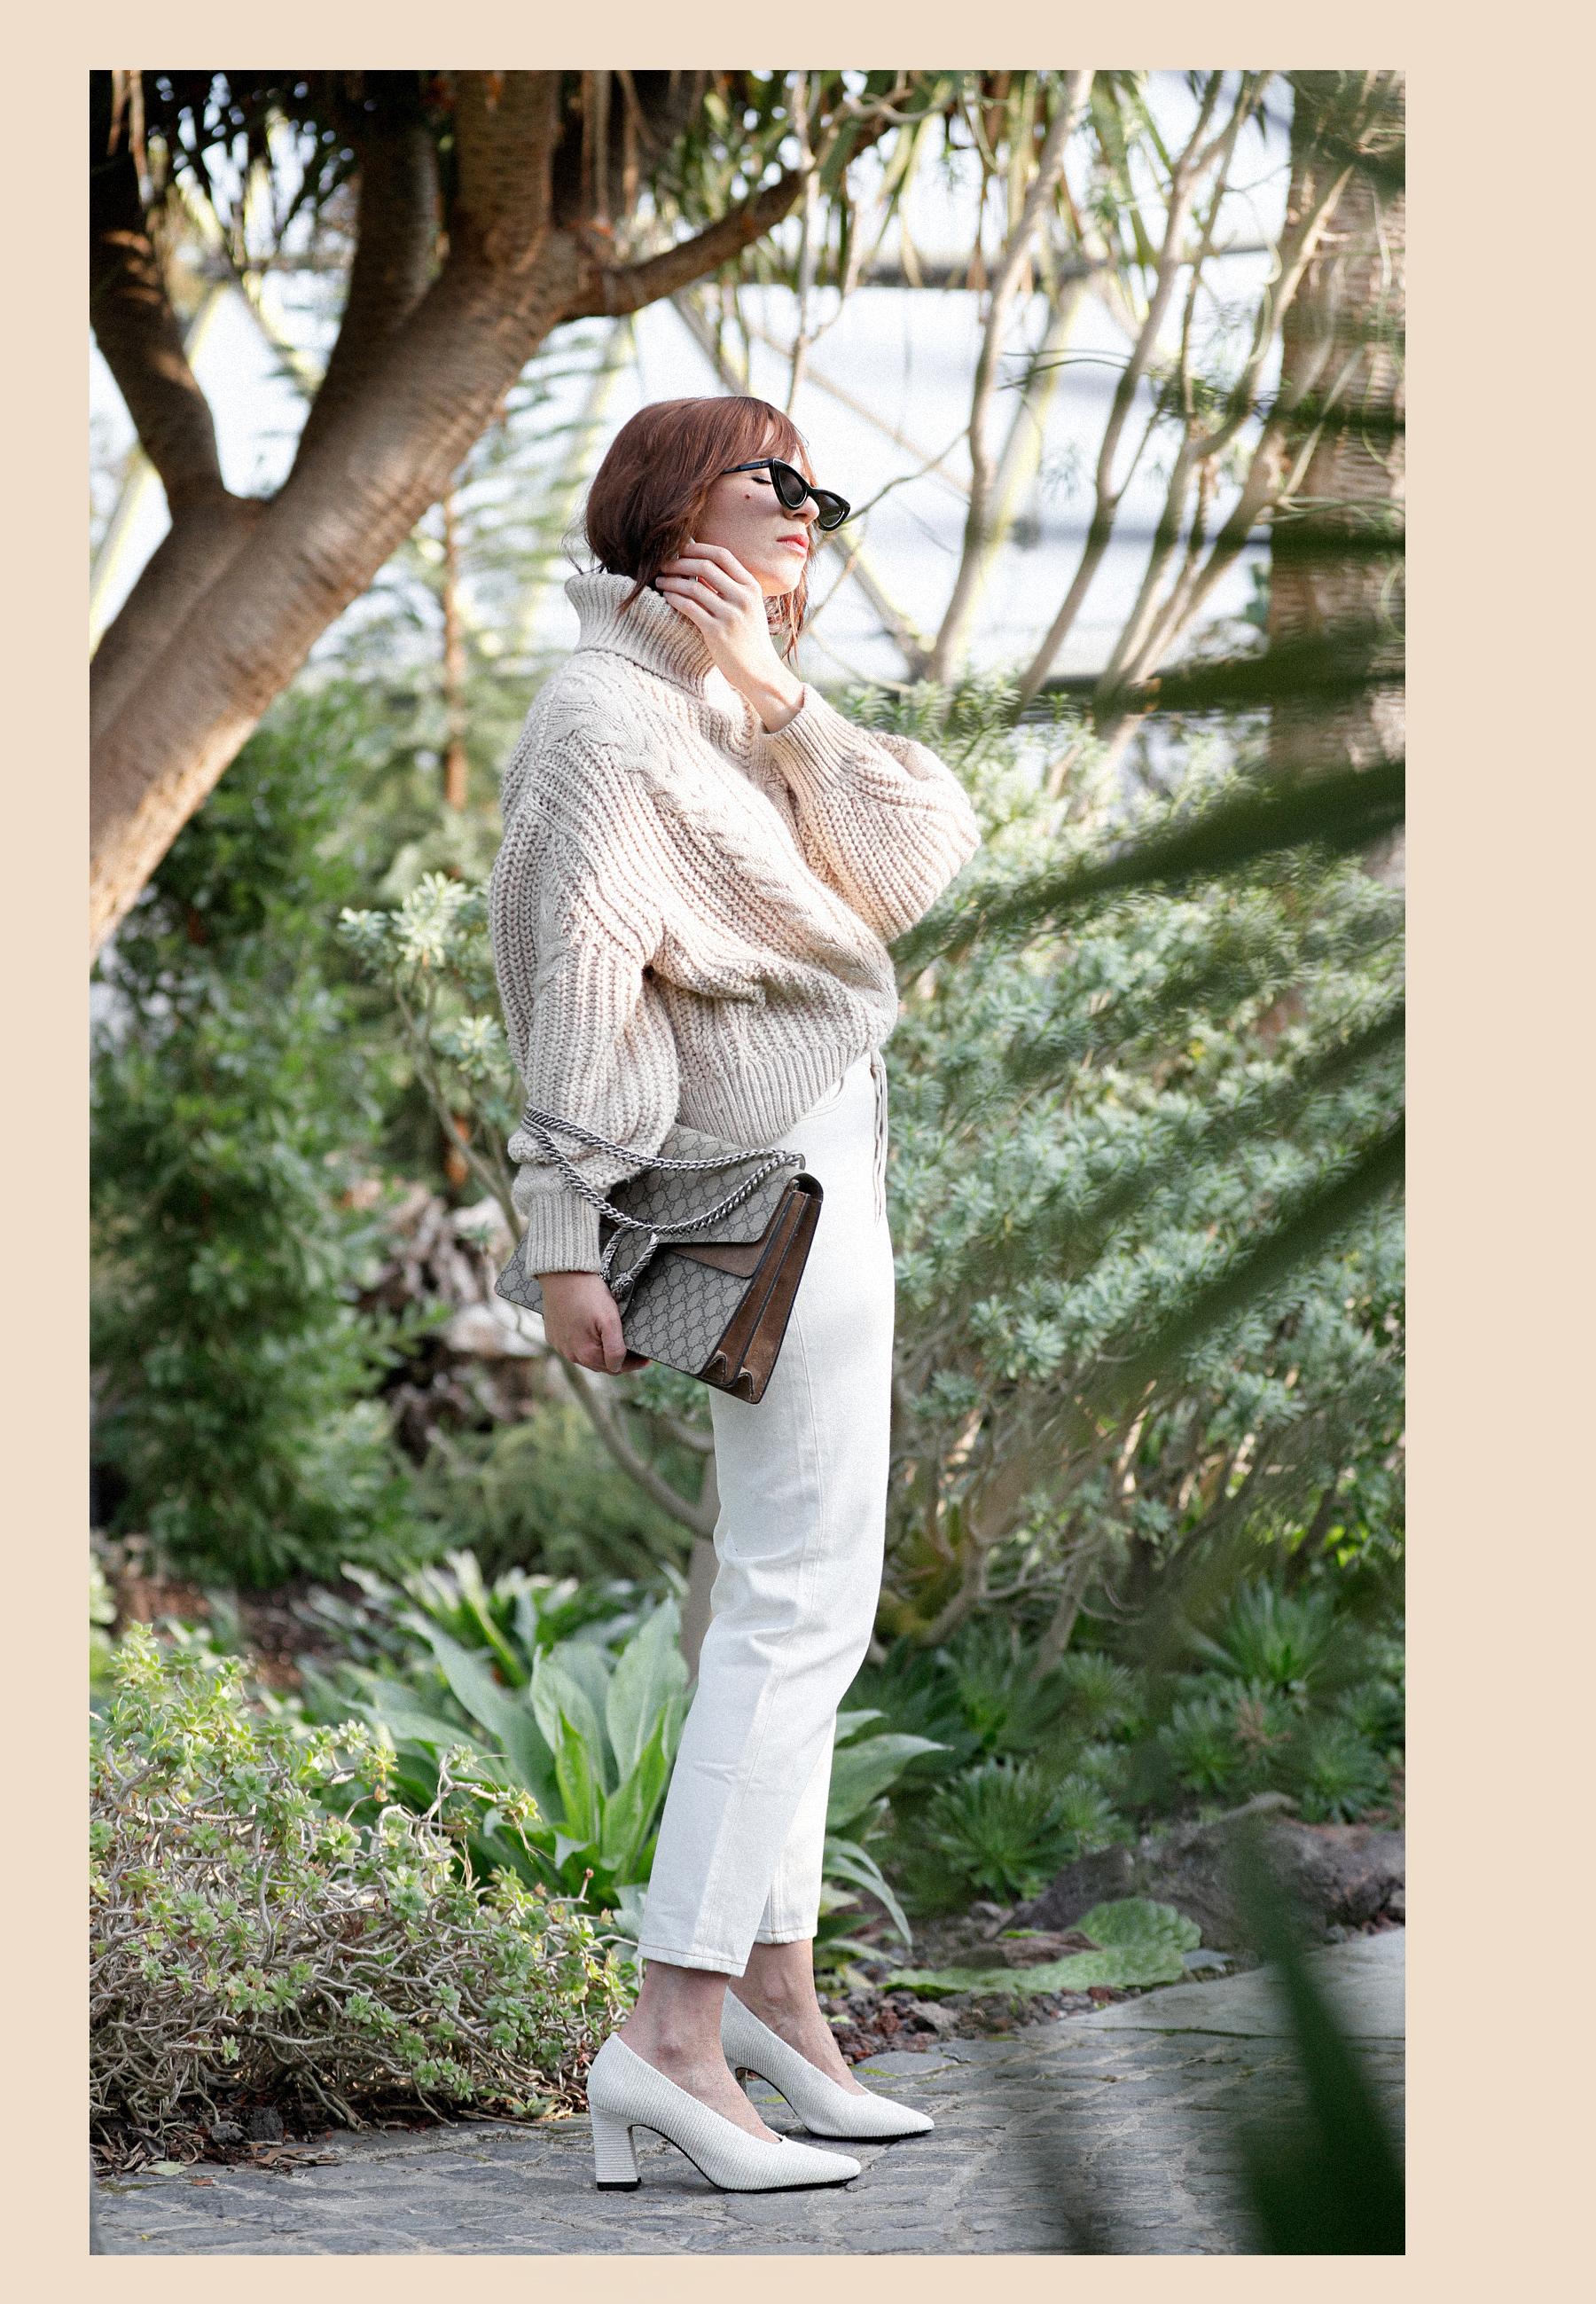 outfit big cable knit white cord pumps mango adam selman x le specs last lolita sunglasses ootd outfitblogger styleblogger modeblogger catsanddogsblog düsseldorf ricarda schernus max bechmann fotografie film 6